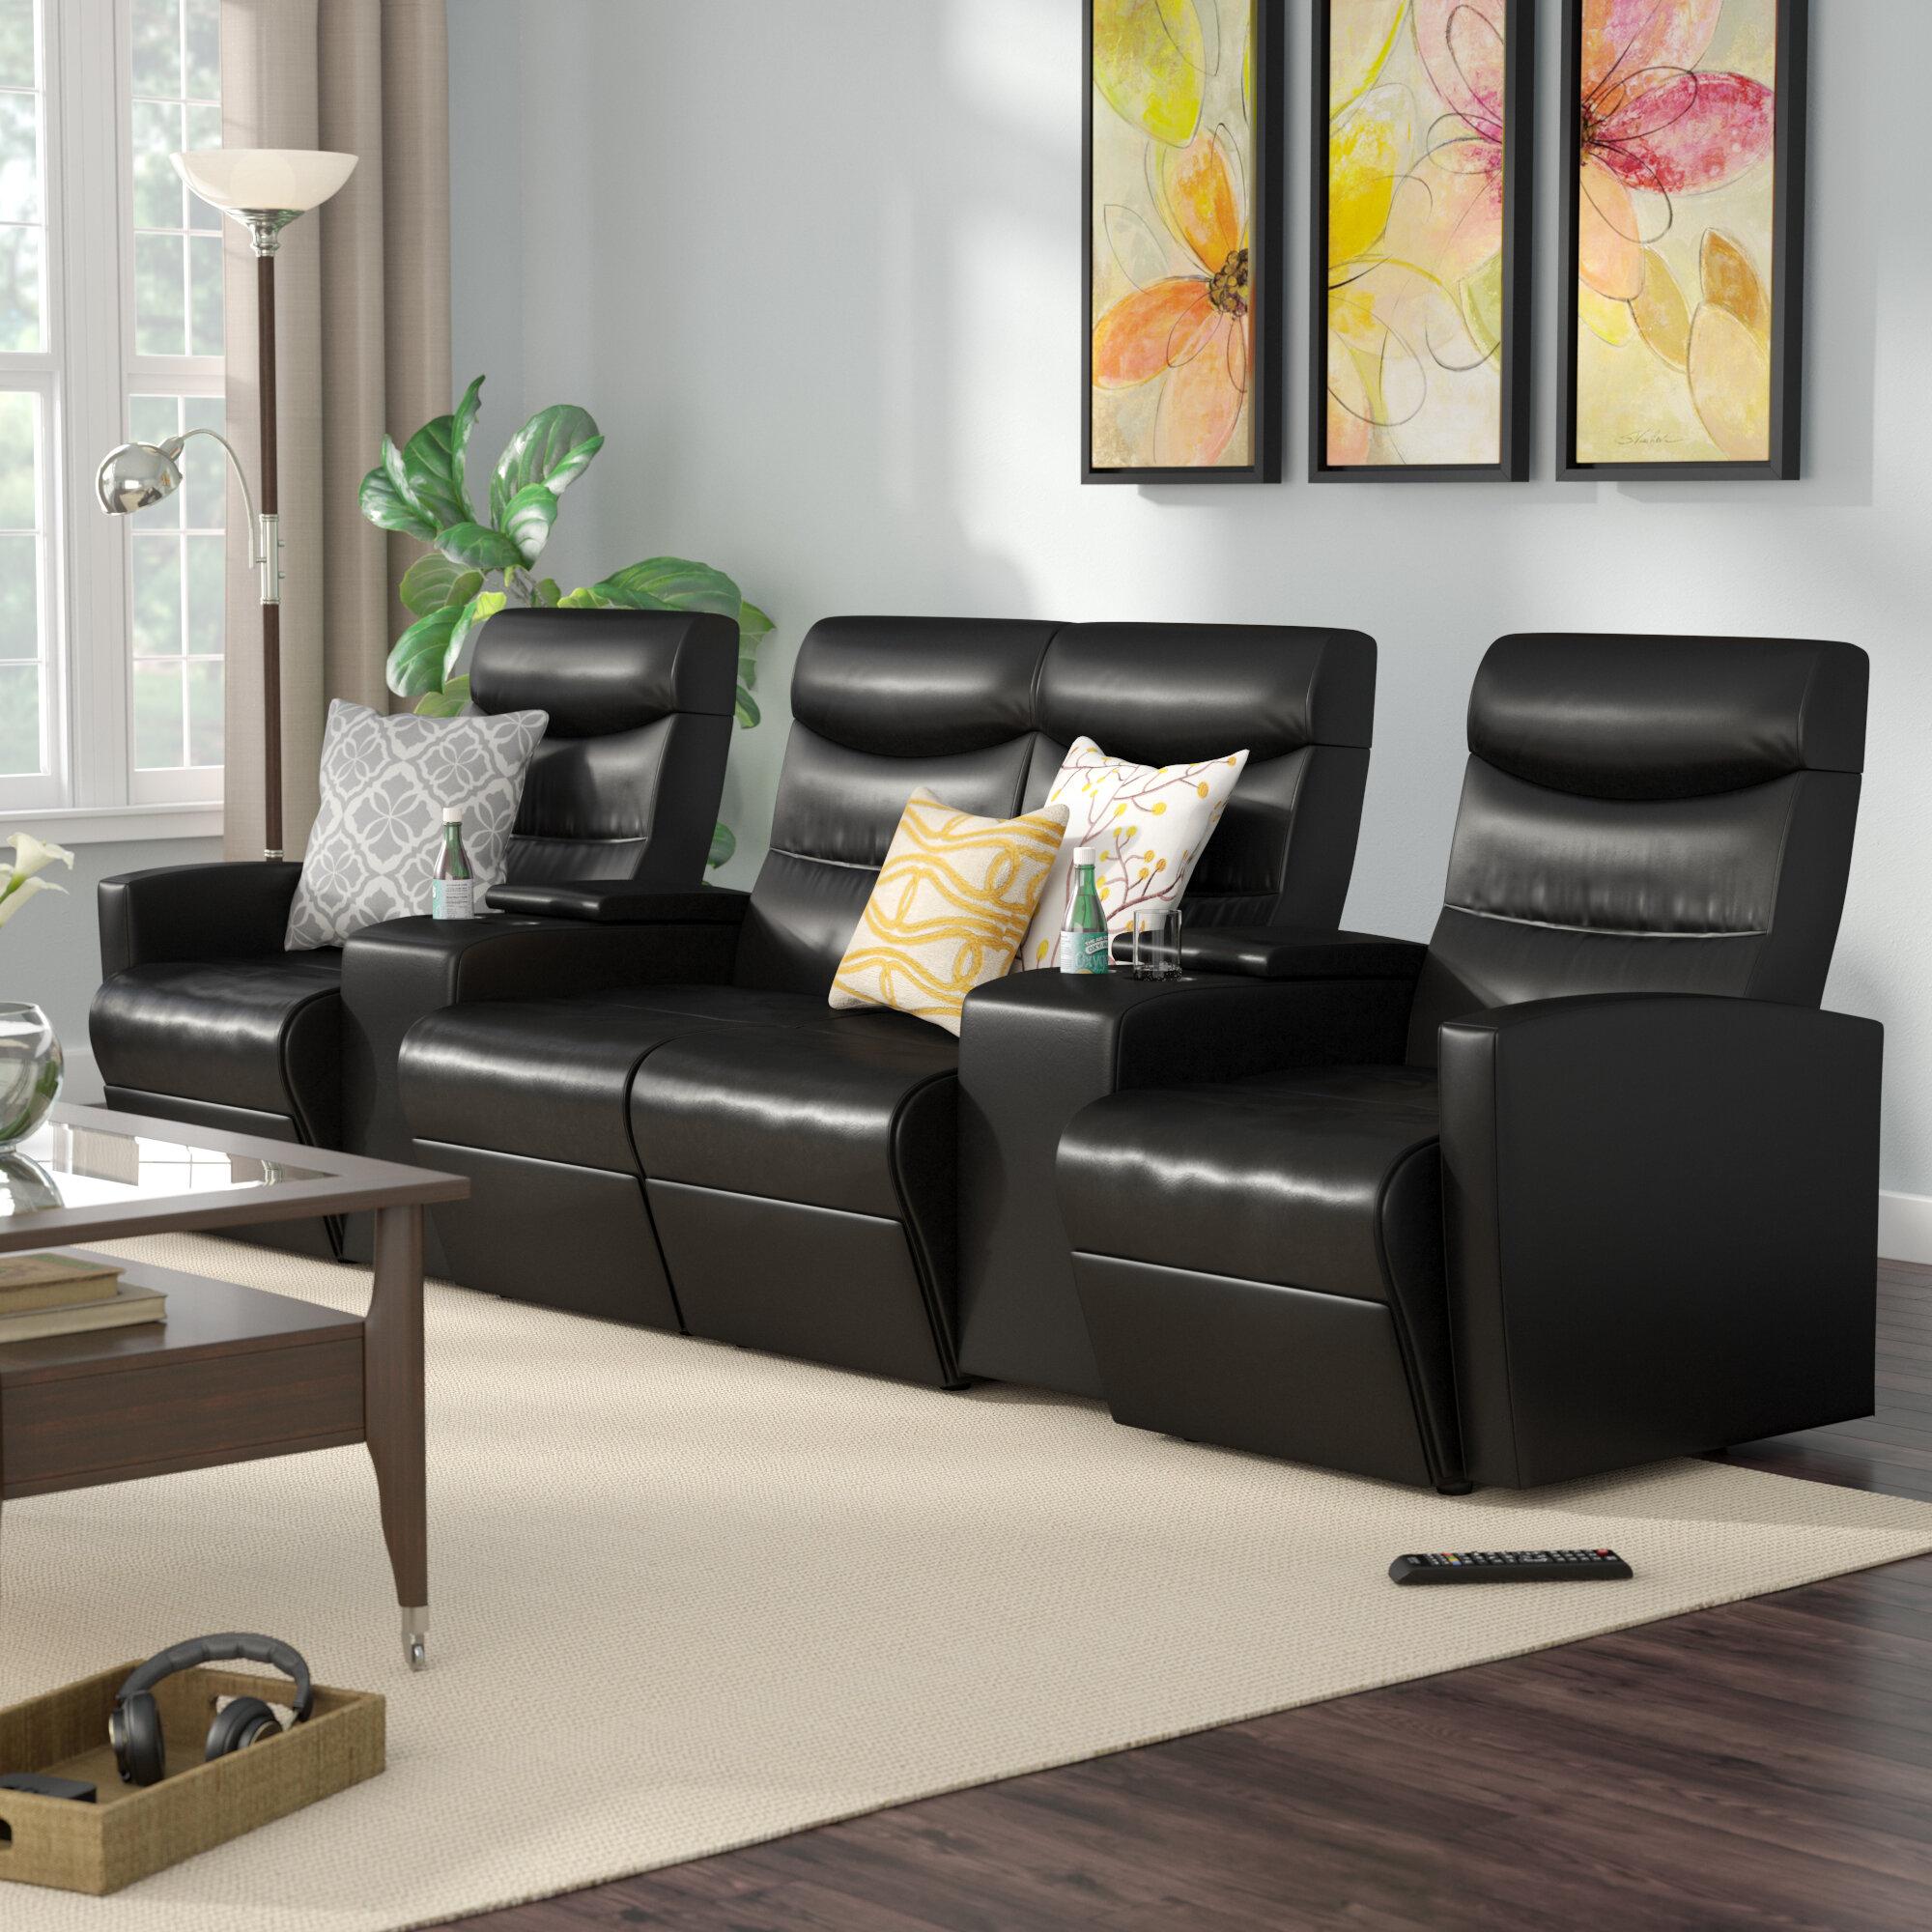 Red Barrel Studio Skiba 4 Seat Home Theater Recliner U0026 Reviews | Wayfair